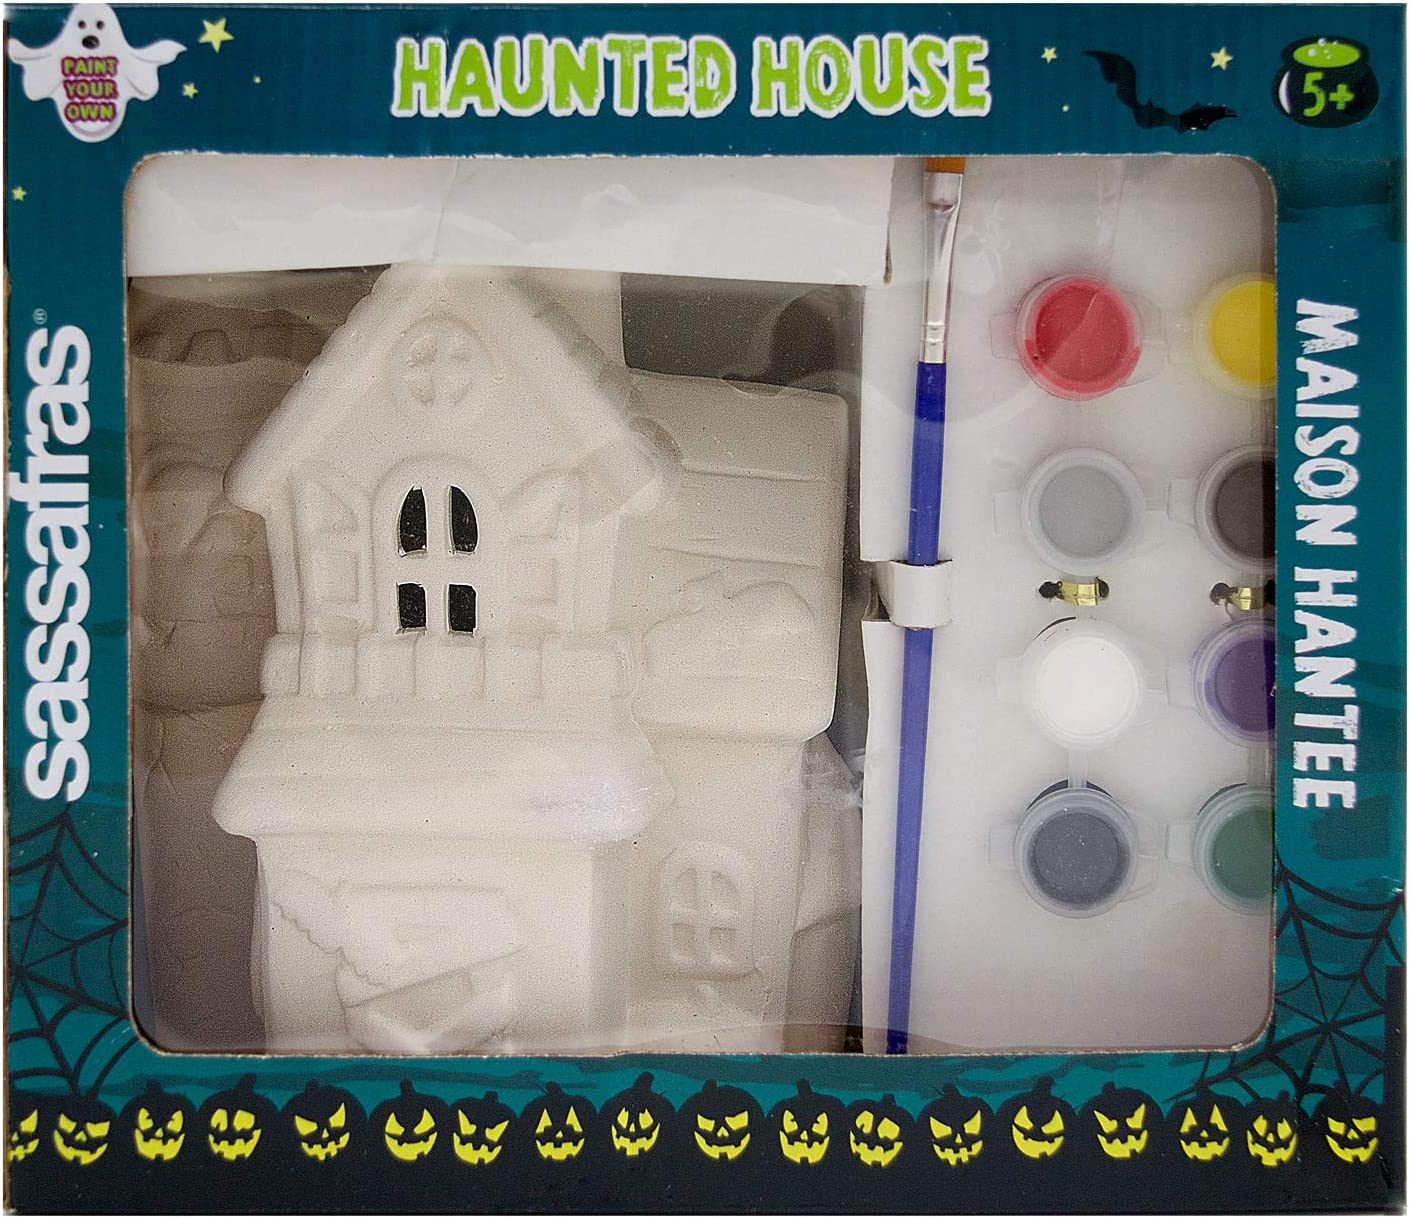 Sassafras Paint Your Own Haunted House Ceramic Set